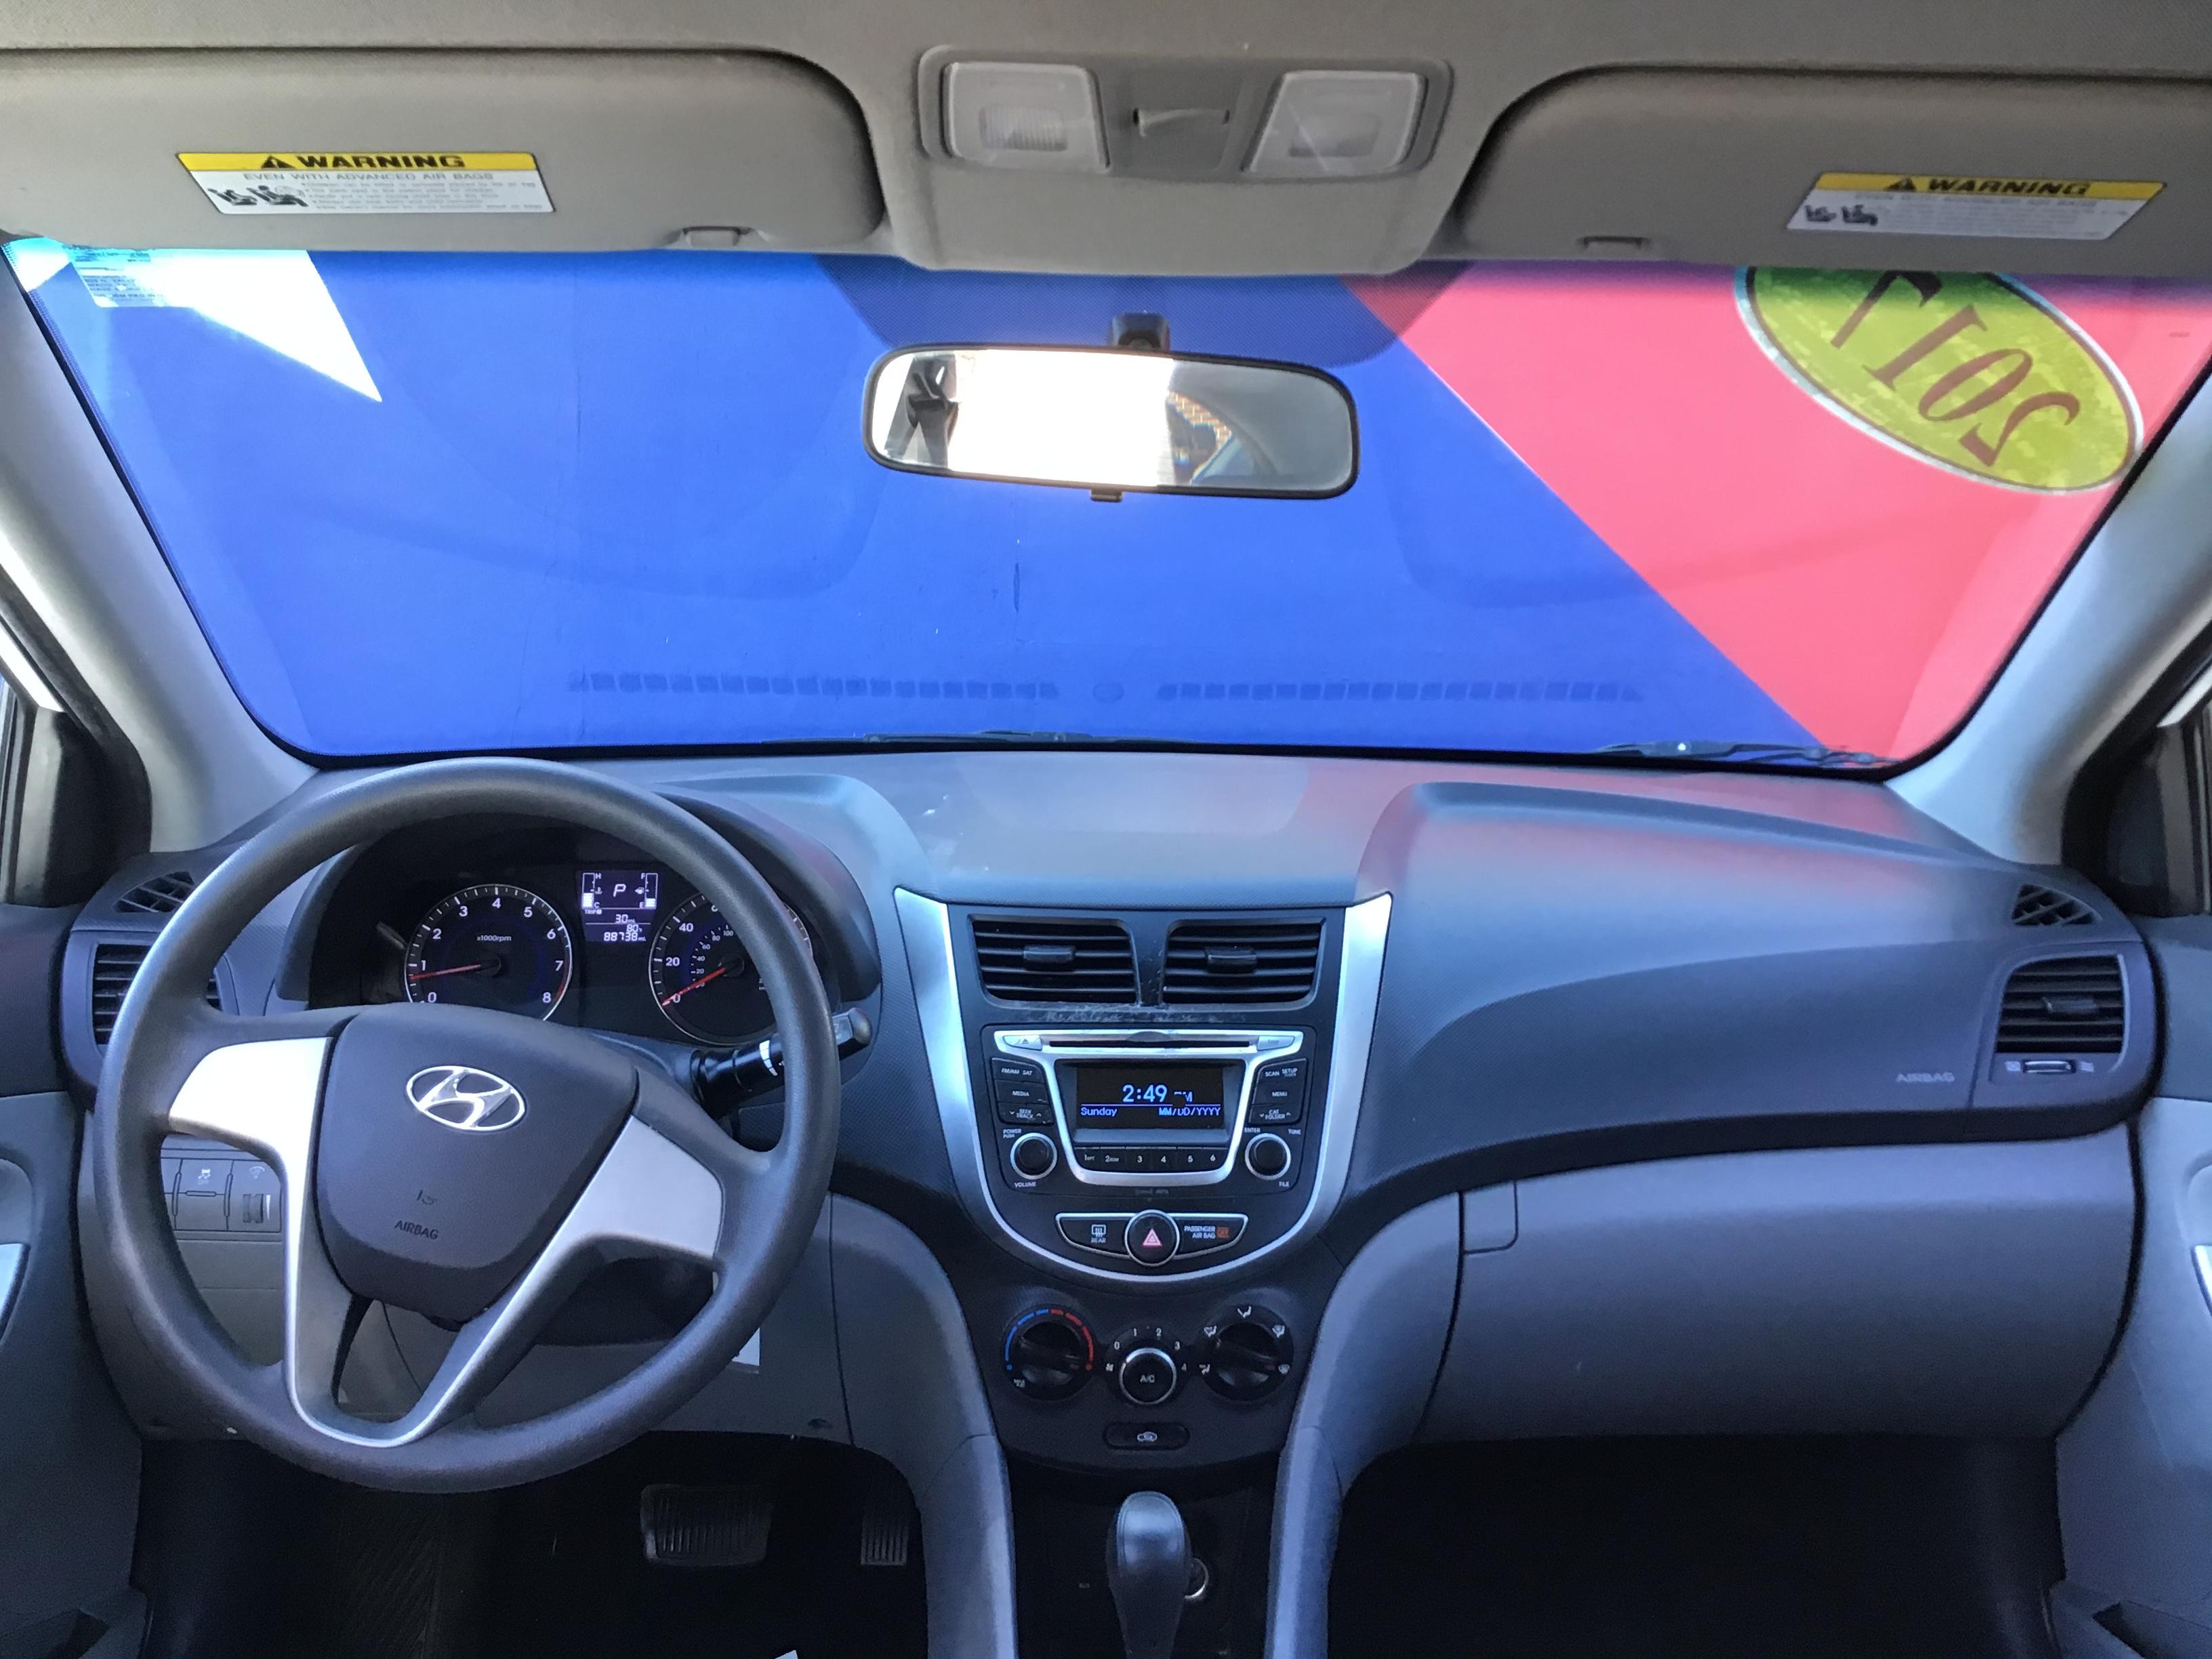 used vehicle - Sedan HYUNDAI ACCENT 2017